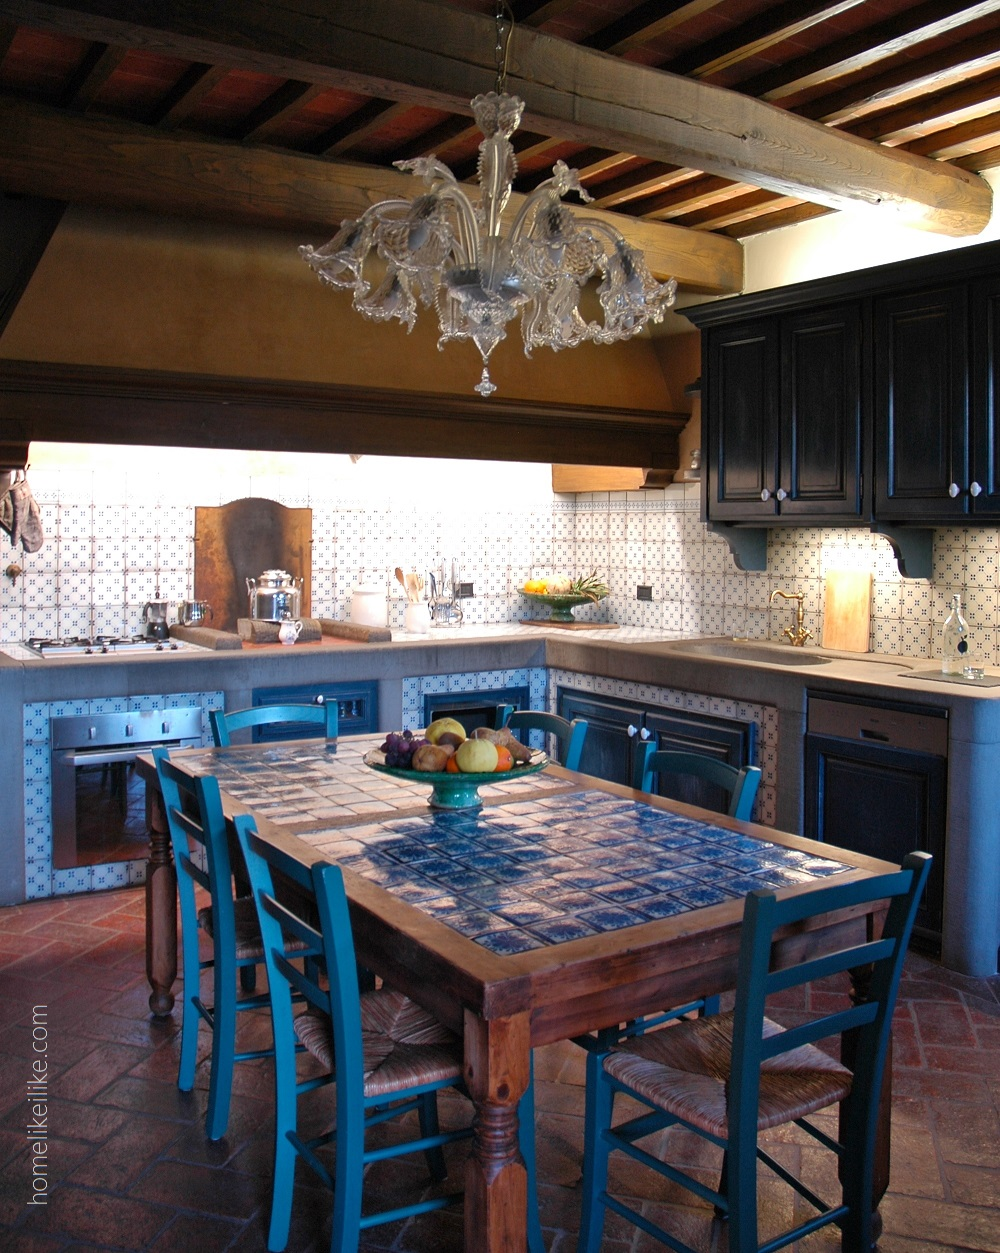 tuskany kitchen - homelikeilike.com